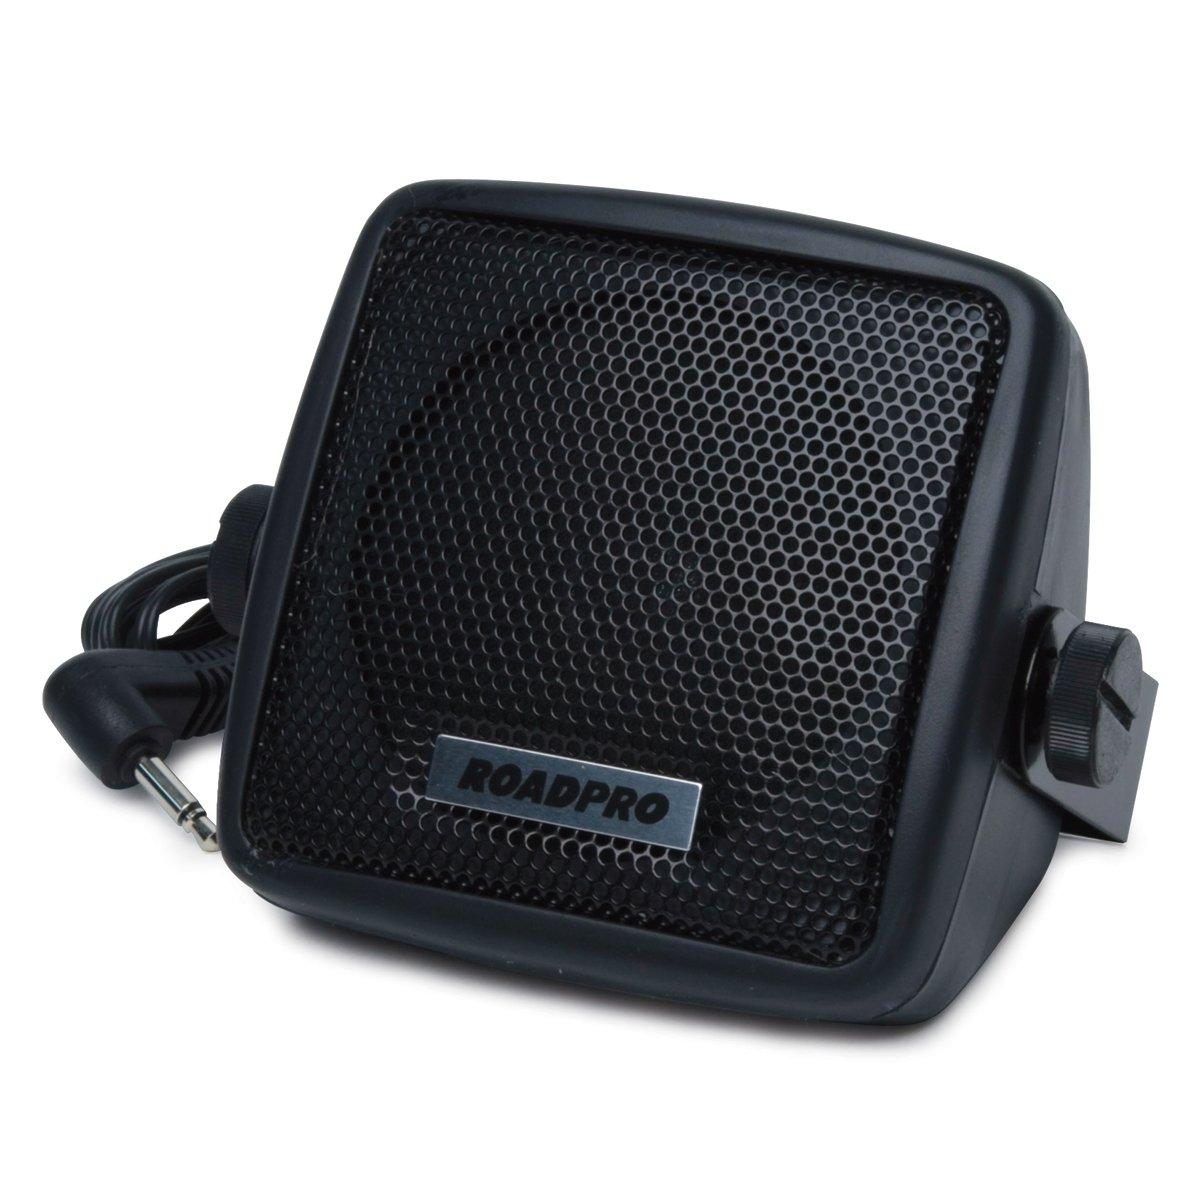 RoadPro RP 108C Extension Speaker Bracket